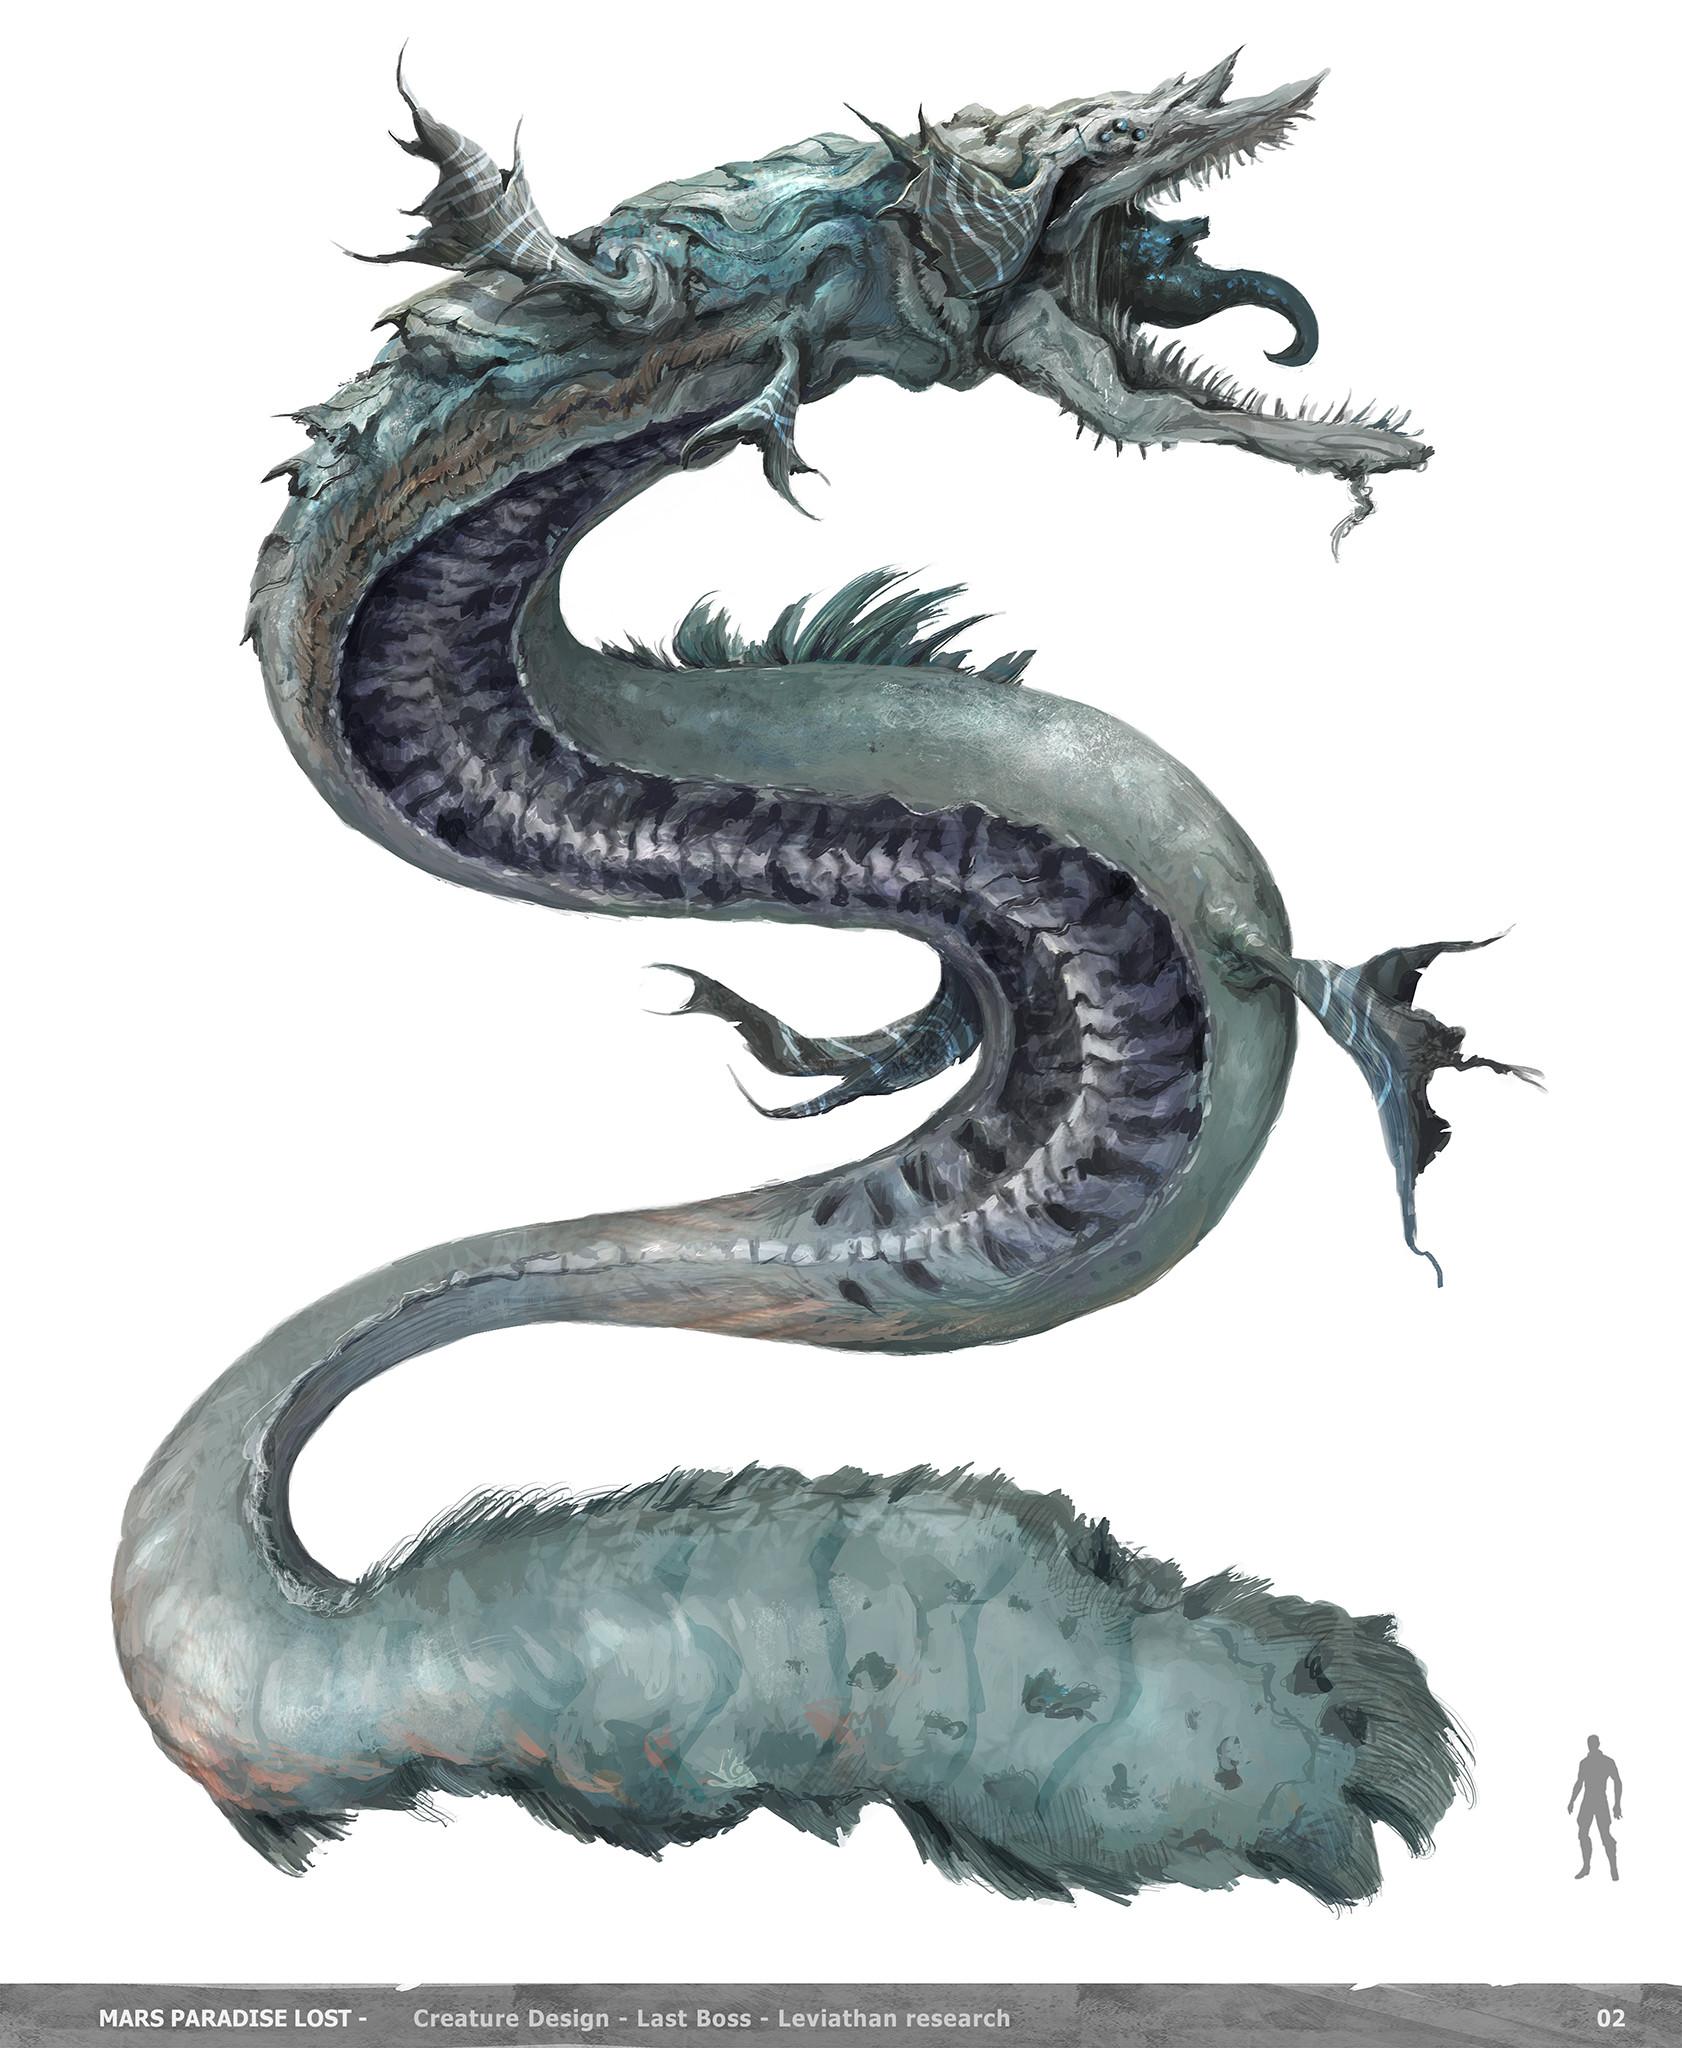 Alexandre chaudret mpl leviathan research02